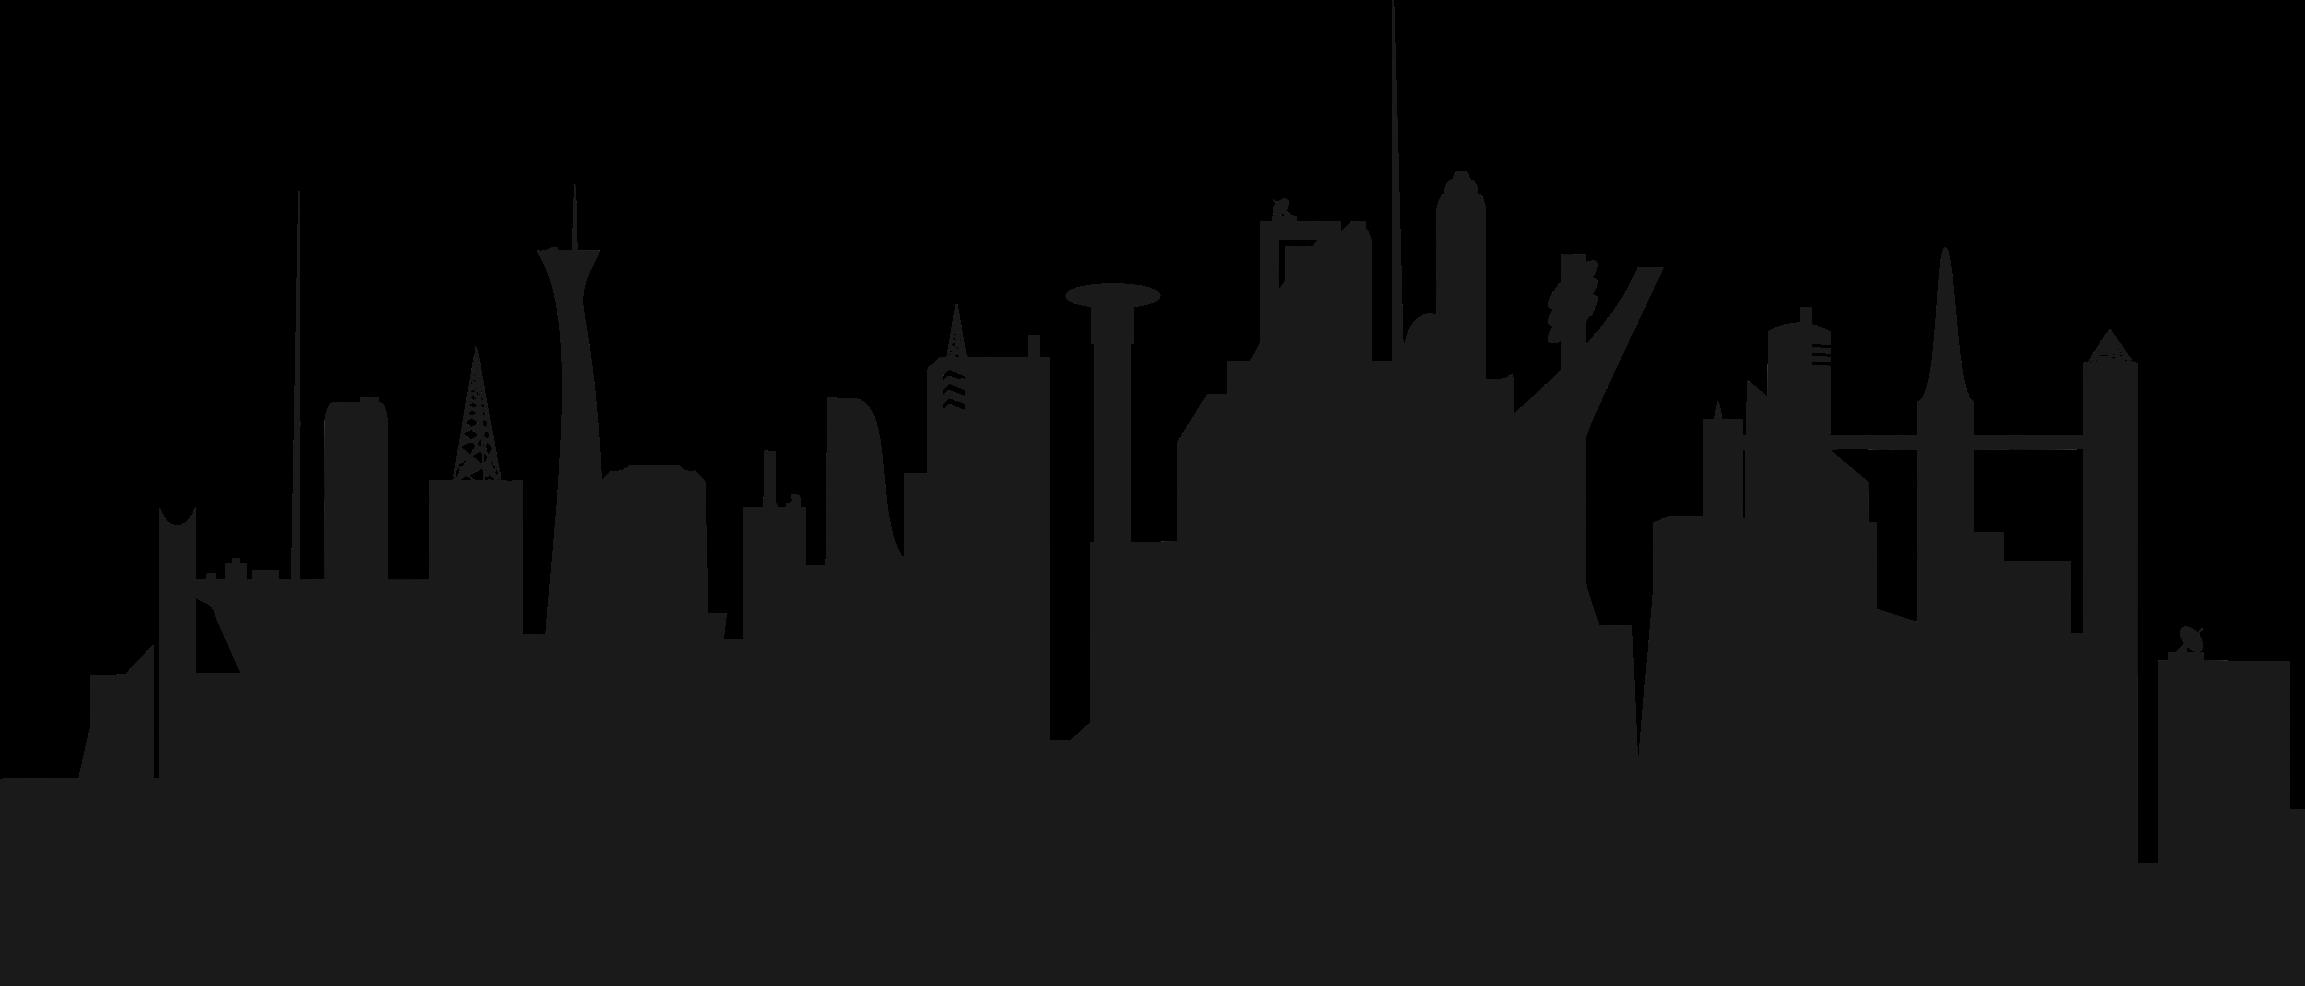 2305x986 Futuristic City Skyline Icons Png